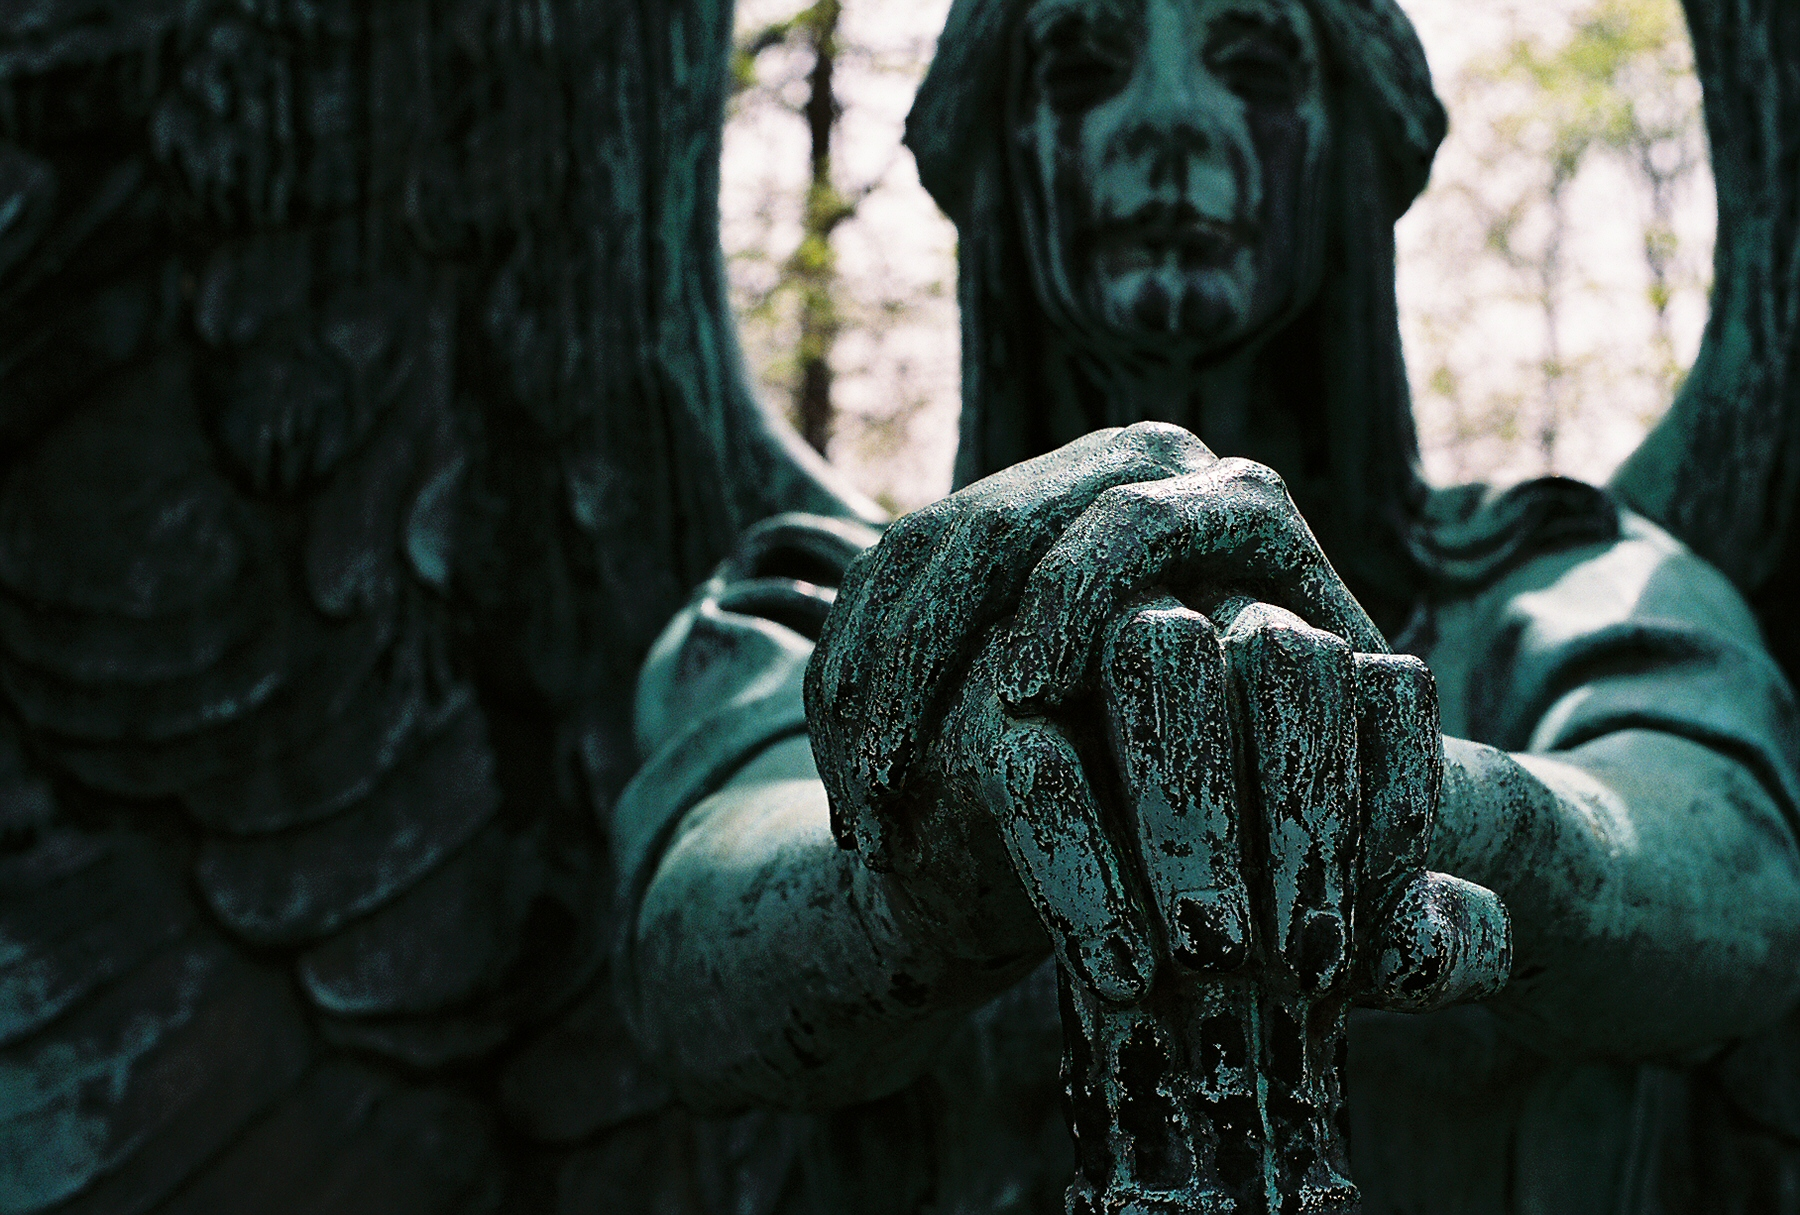 Herman Matzen, 'Angel of Death Victorious' ('Haserot Angel'), bronze, 1924. Lake View Cemetery, Cleveland, Ohio